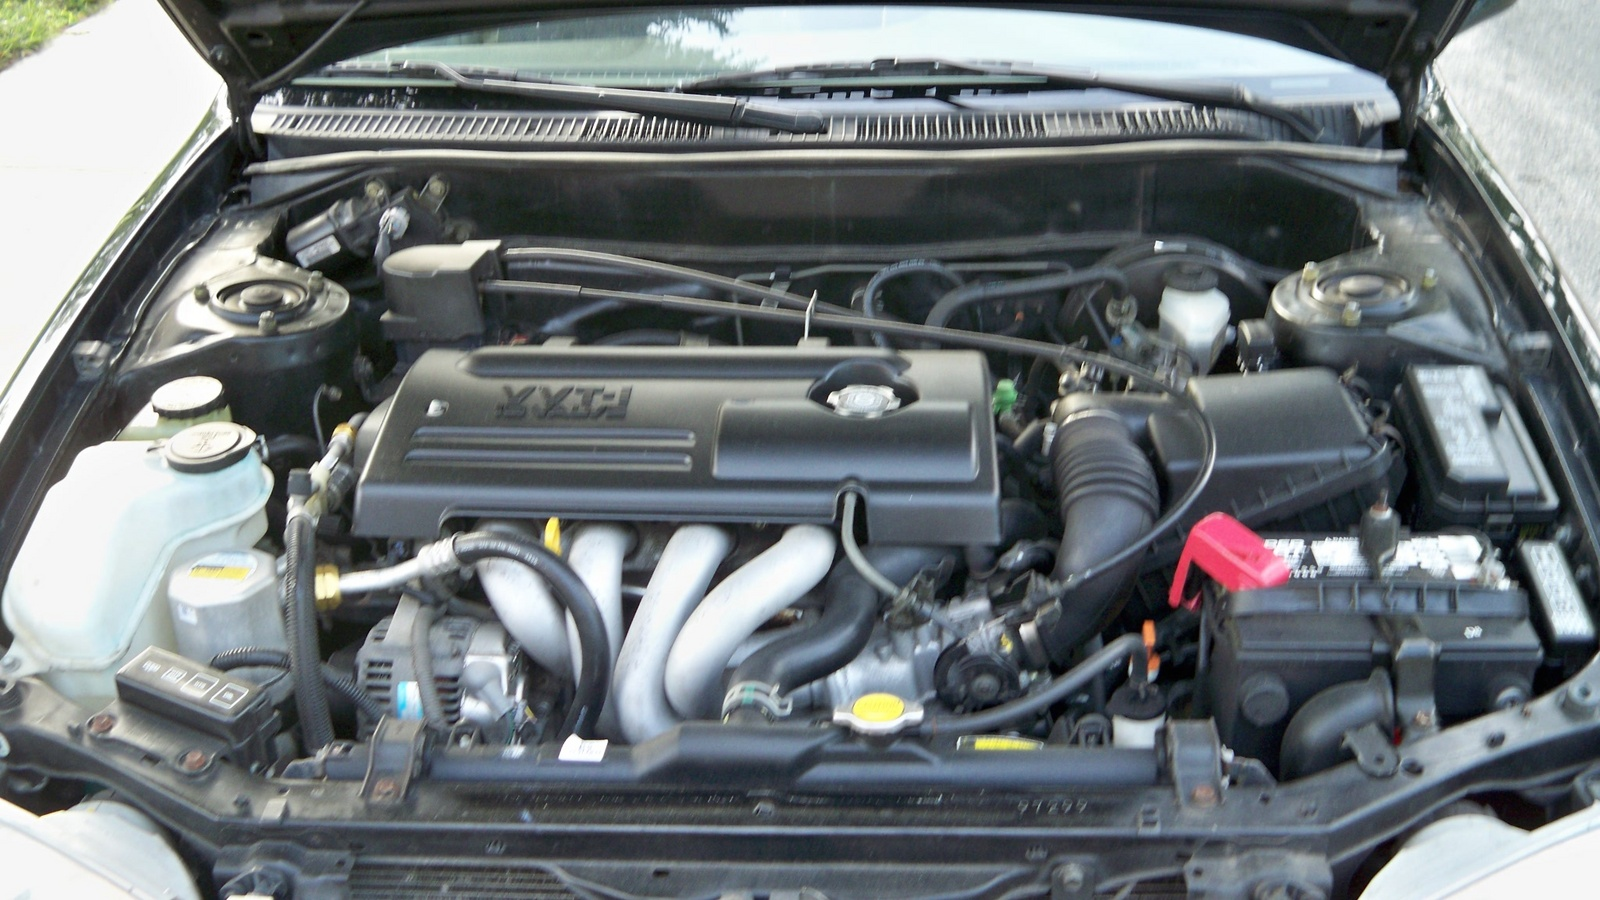 prizm engine specs  prizm  free engine image for user